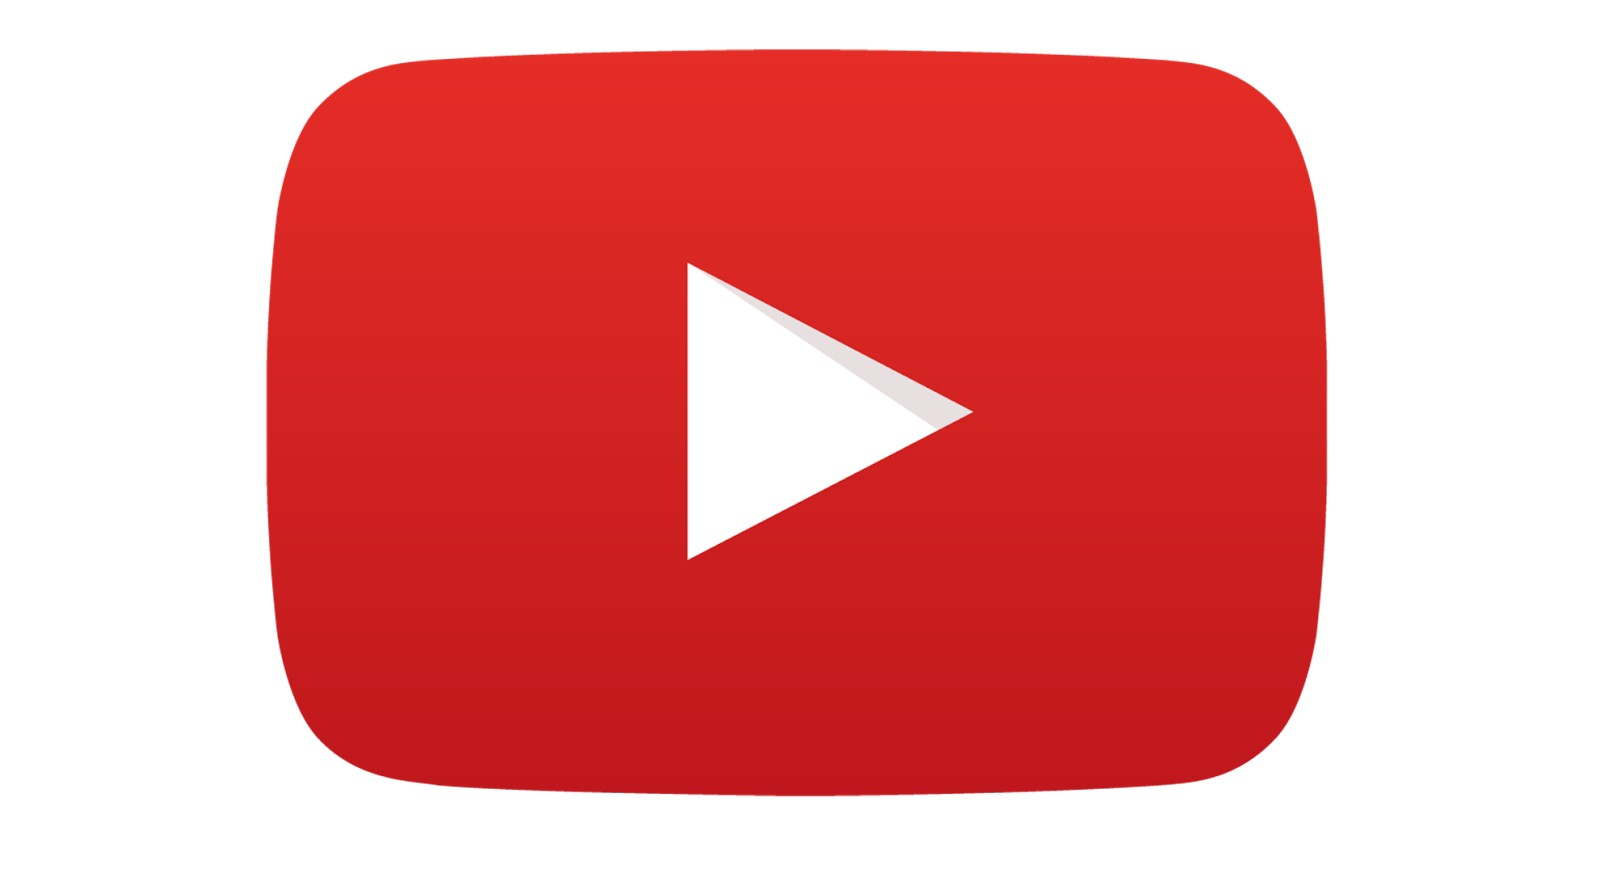 Les chaînes YouTube